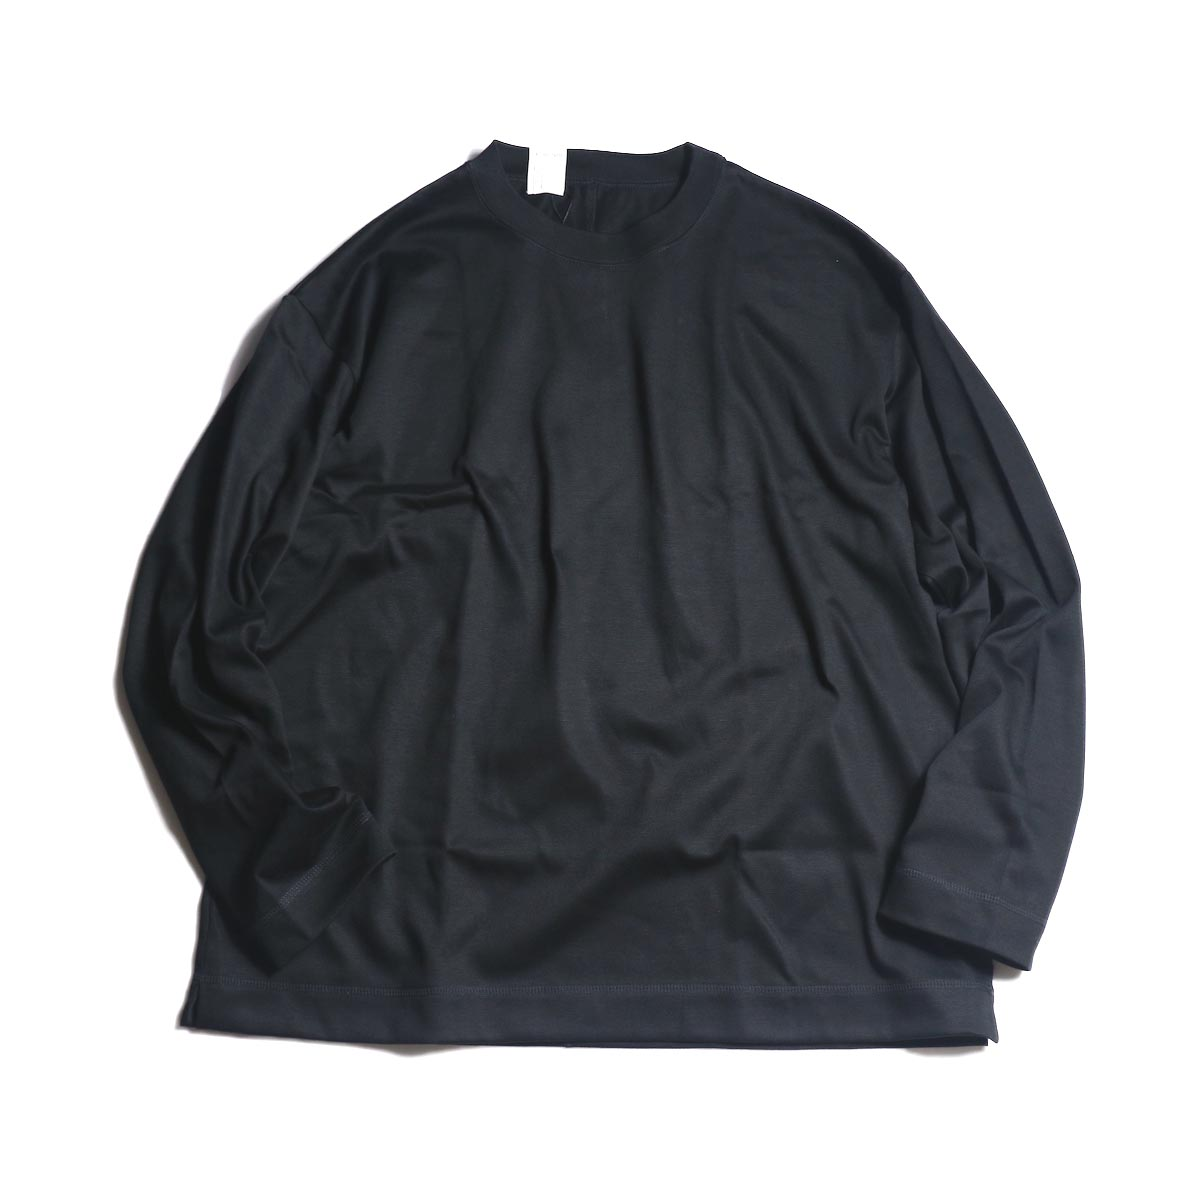 N.HOOLYWOOD / 20RCH-004 Crew Neck Long Sleeve (Black)